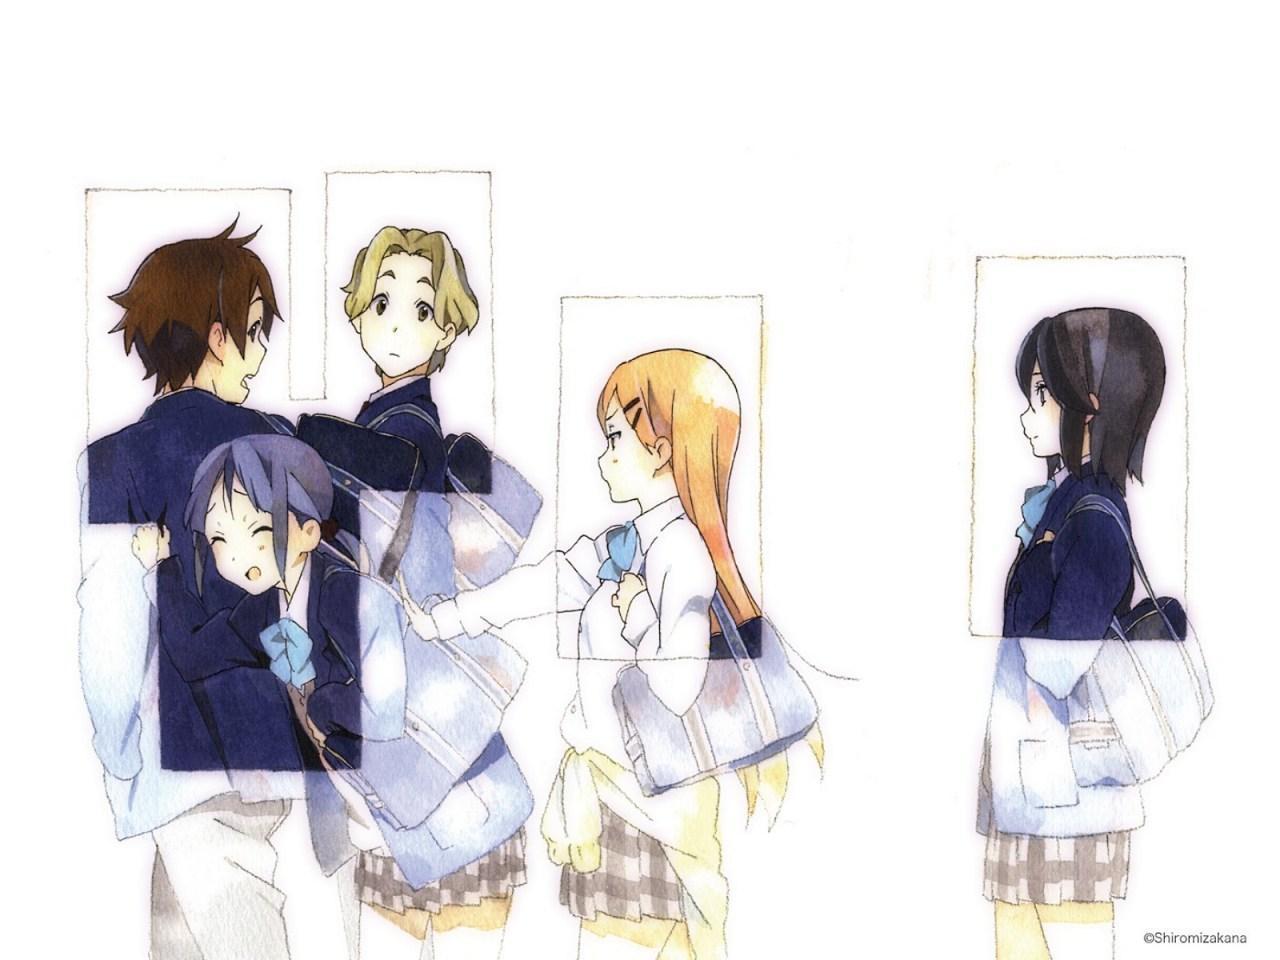 http://blog-imgs-43.fc2.com/a/n/k/ankosokuho/003.jpg